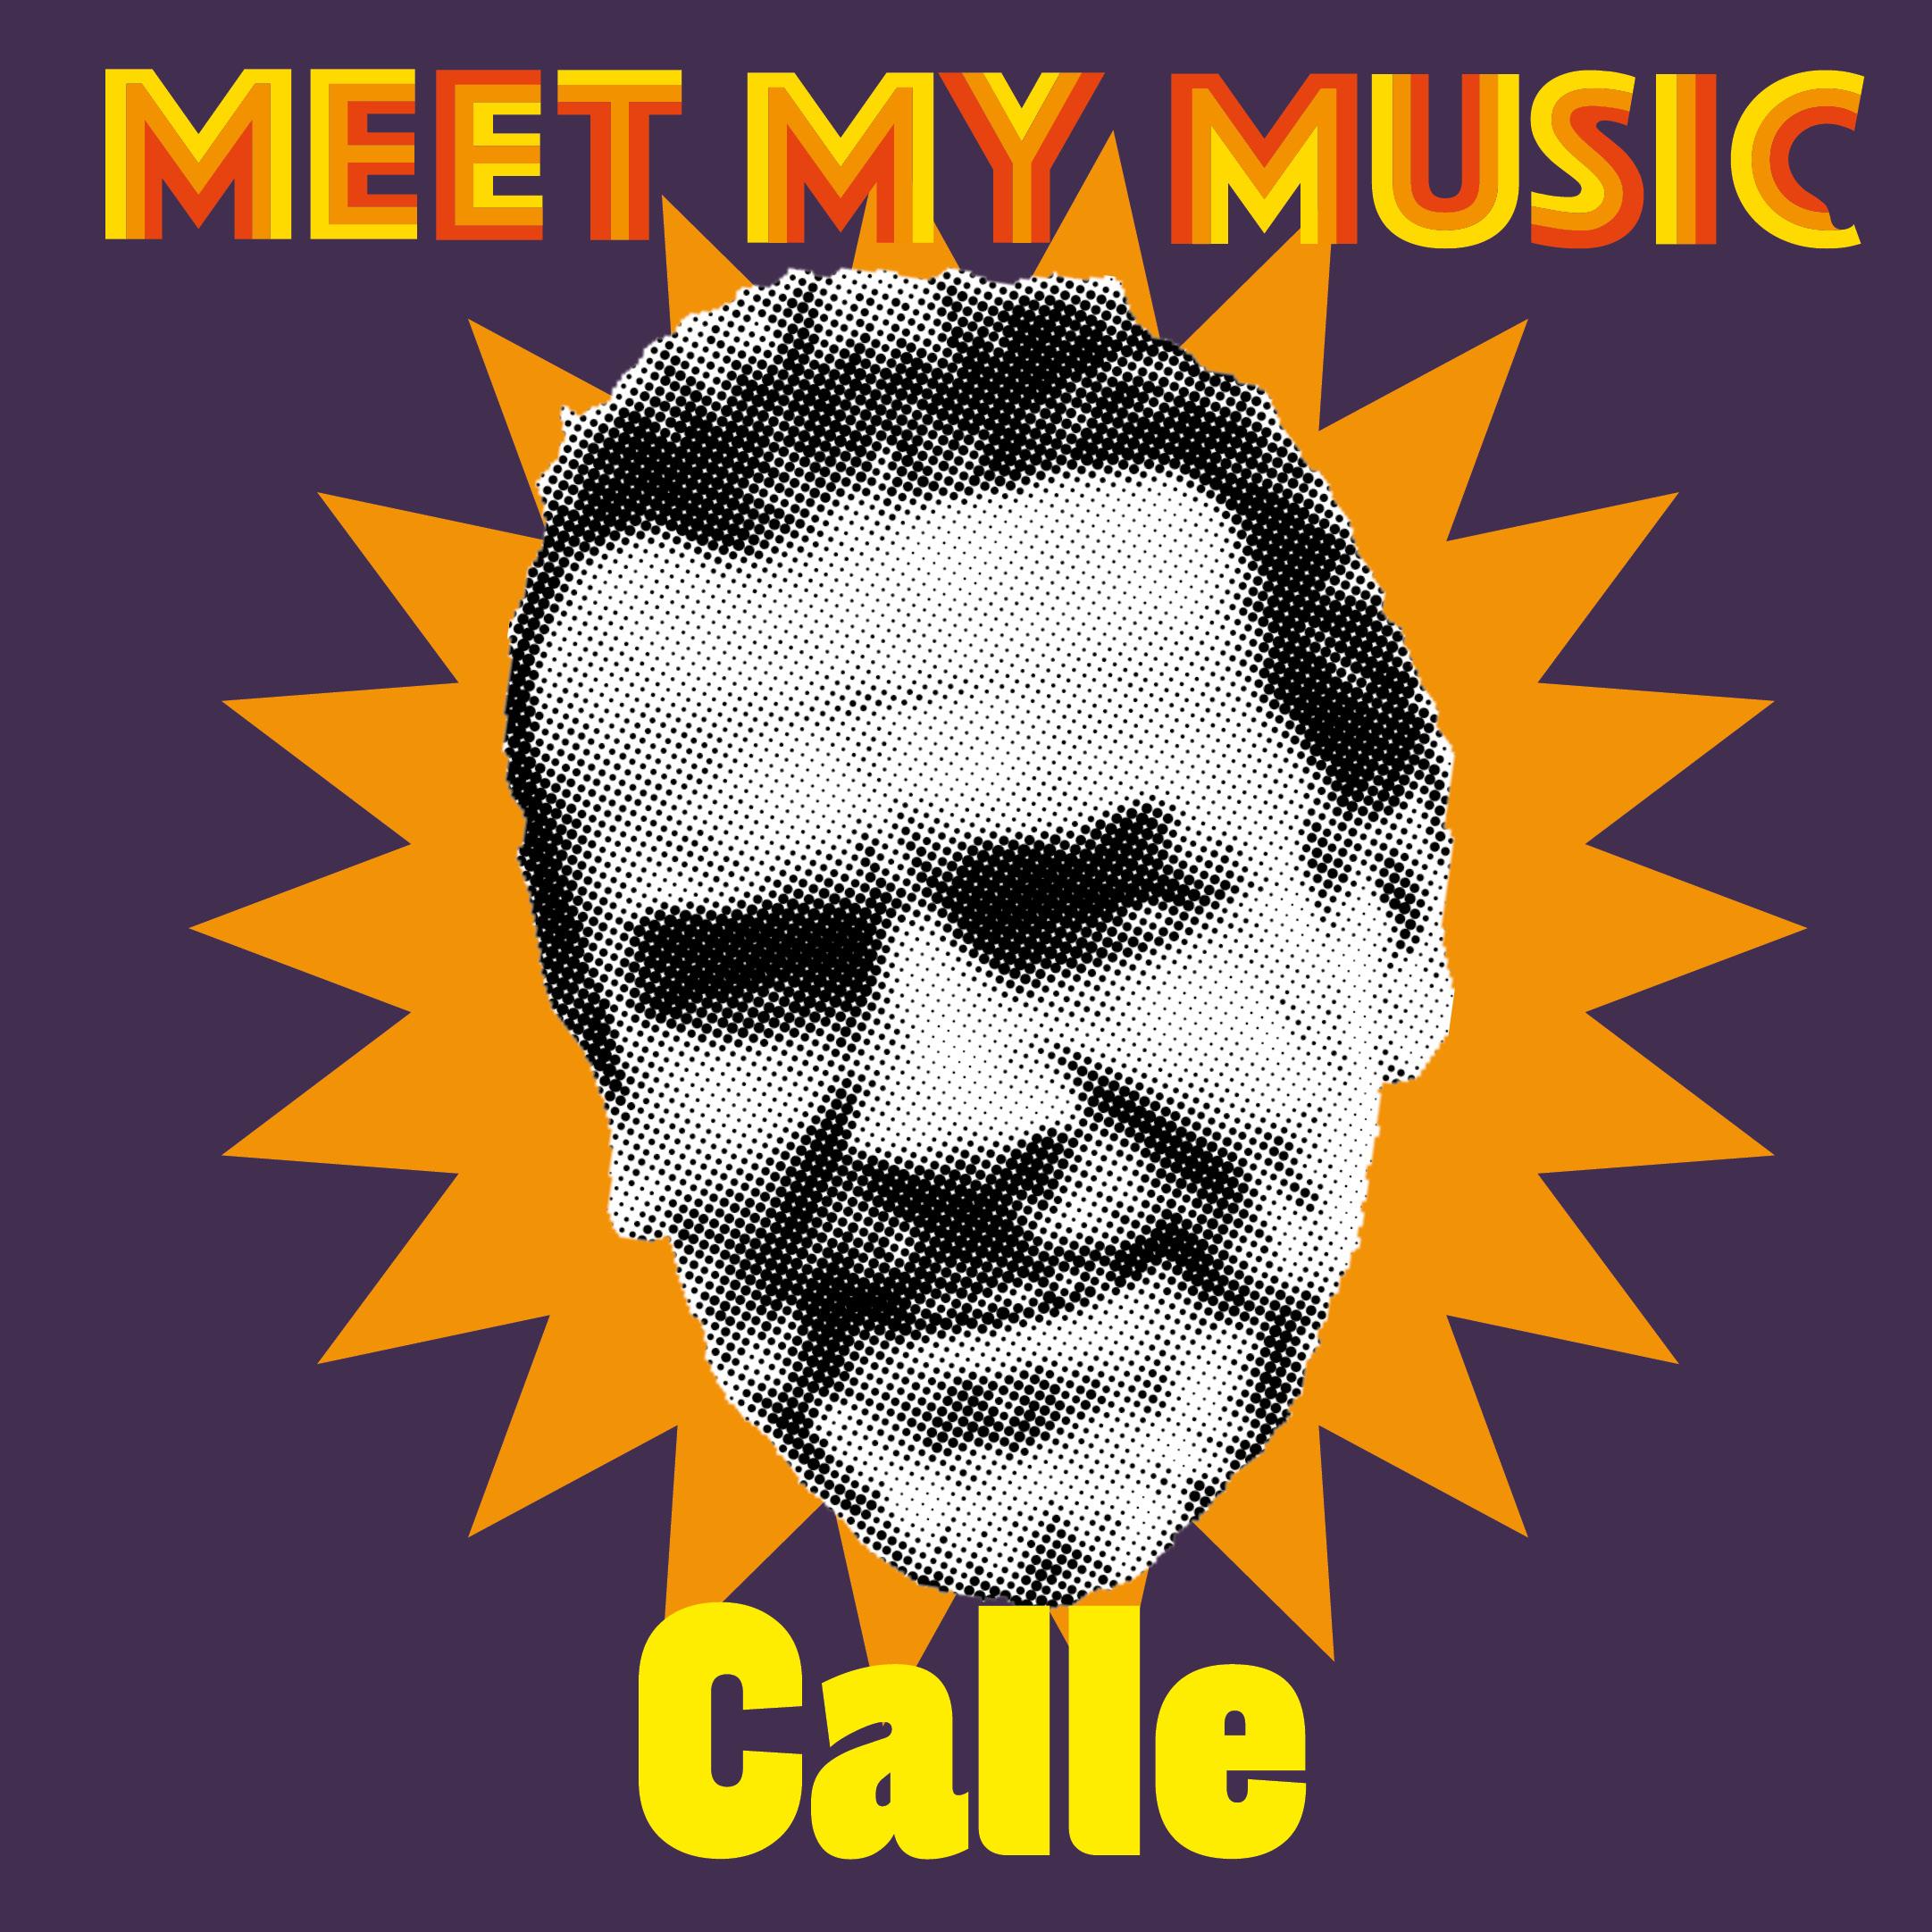 Meet my music Calle 185.jpg